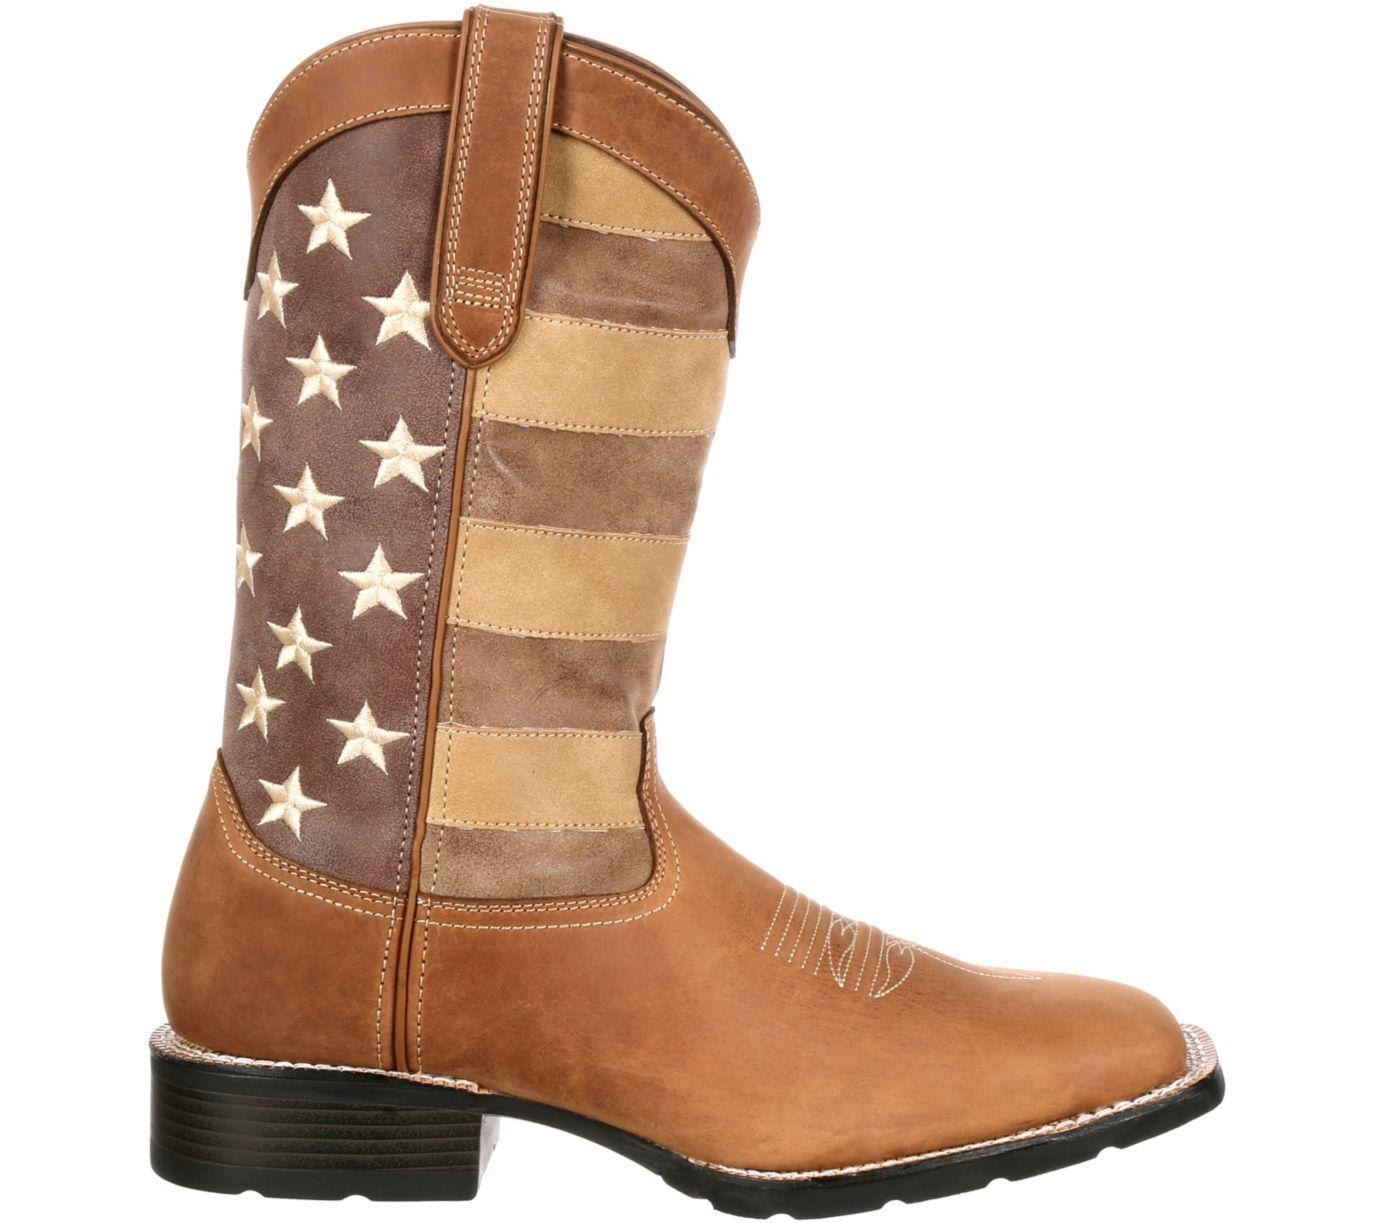 Durango Men's Mustang Faded Glory Western Boots